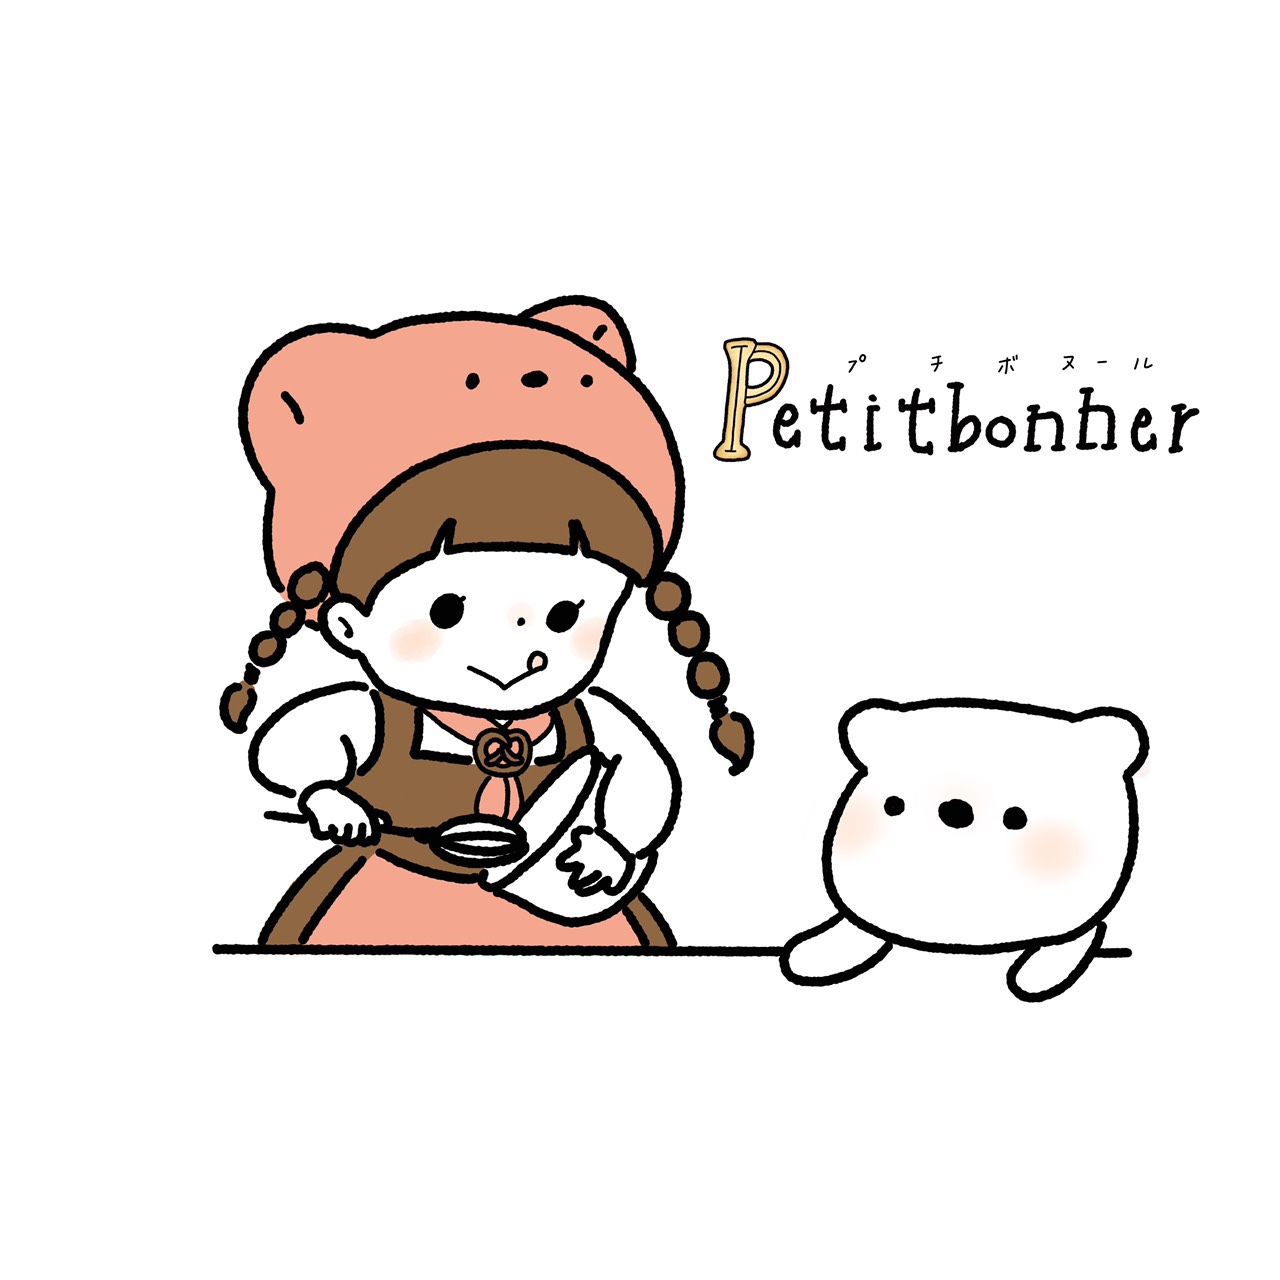 petitebonher